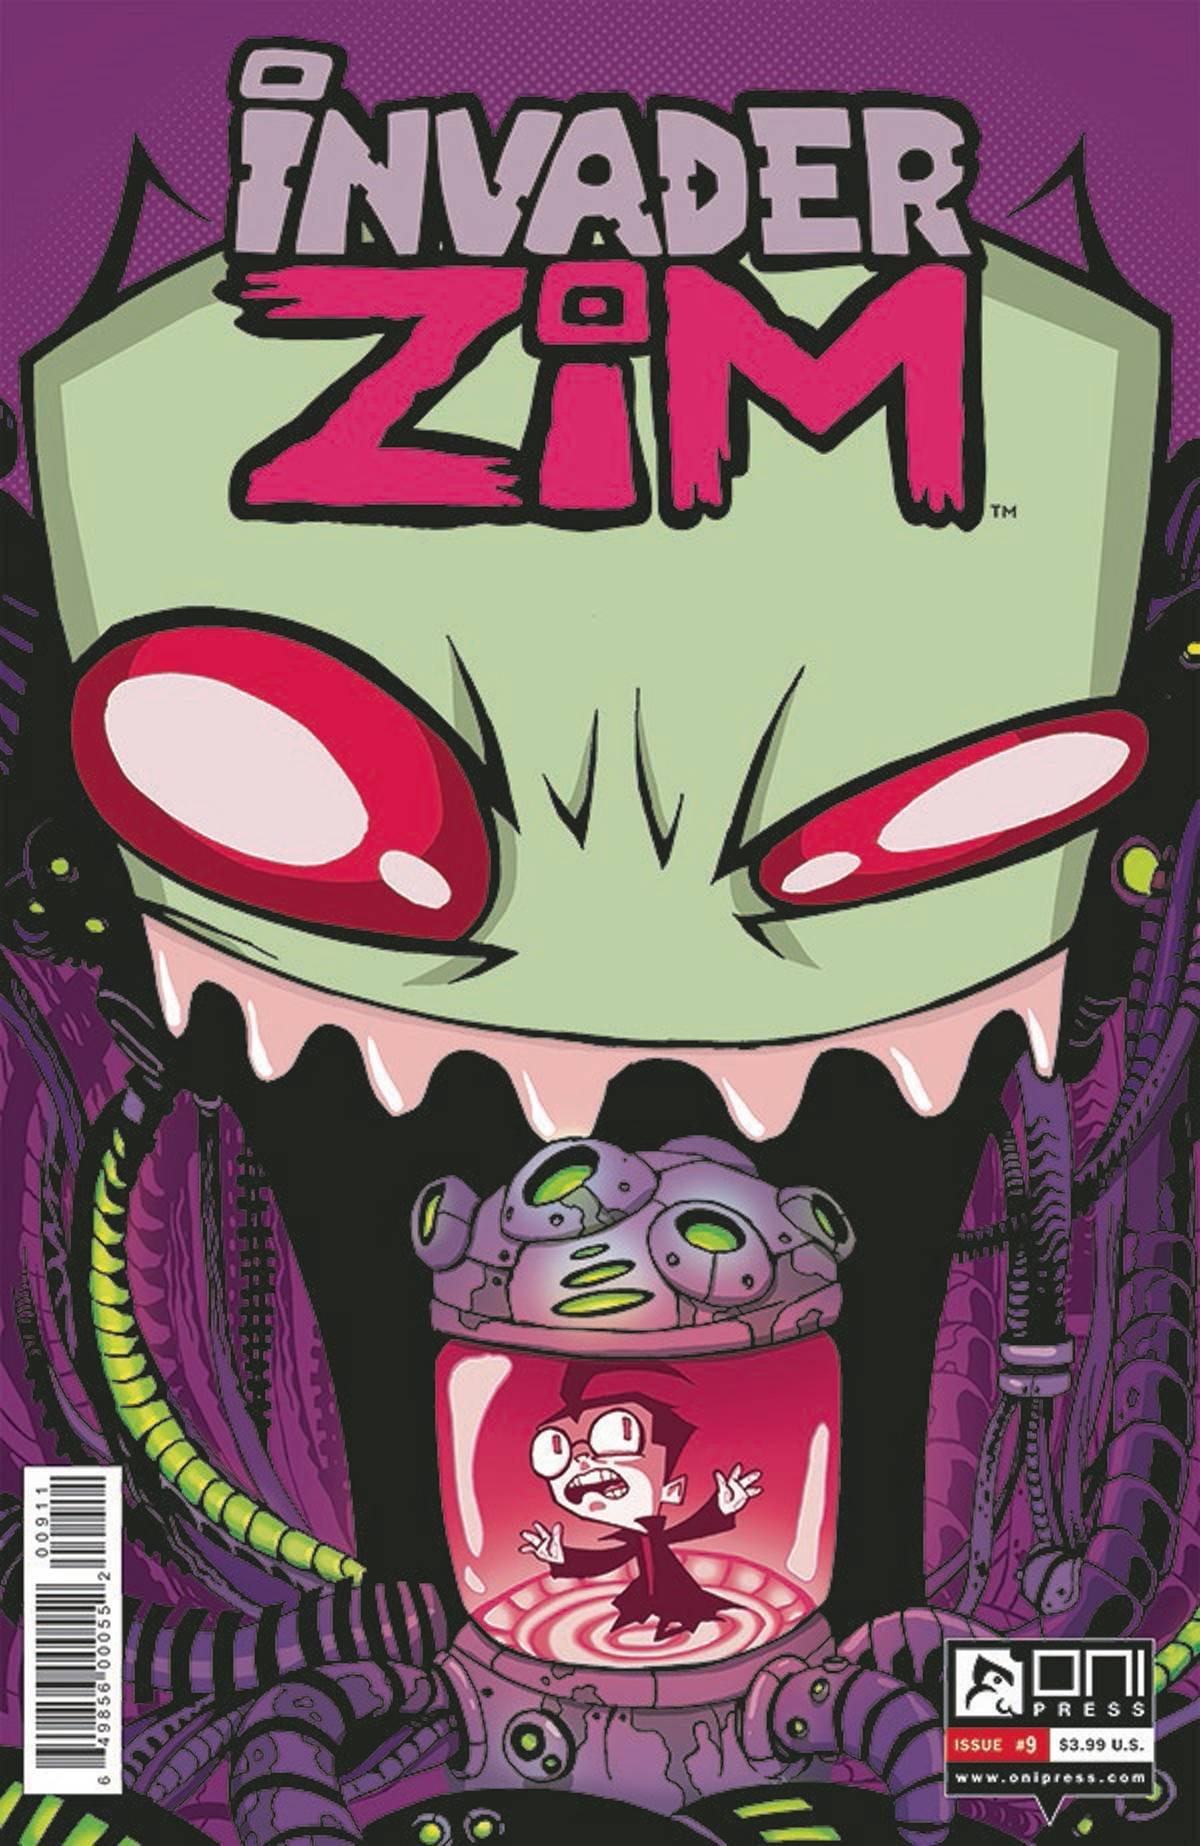 INVADER ZIM #9 Cover A ebook